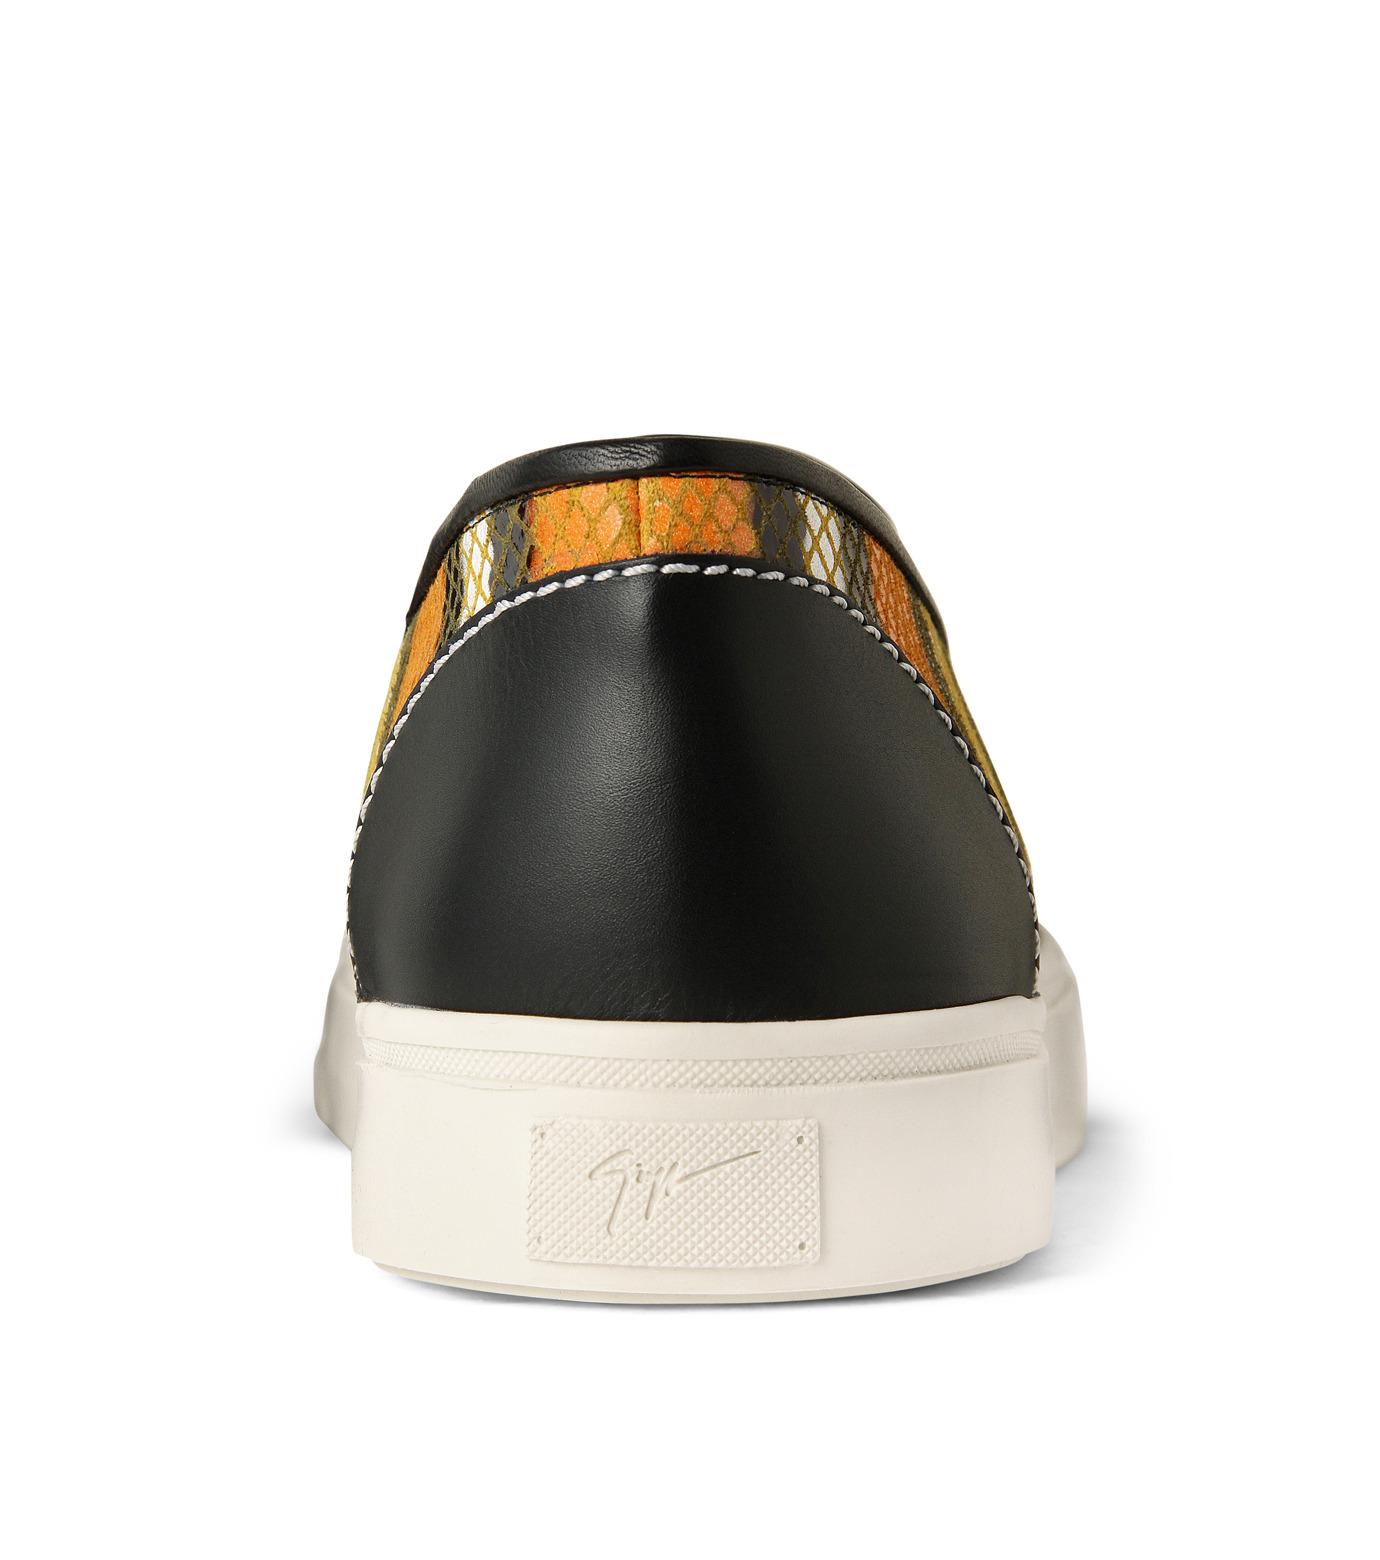 Giuseppe Zanotti Design(ジュゼッペザノッティ)のStripe Slip-On Sneaker-RED(シューズ/shoes)-RM5043MD-62 拡大詳細画像2